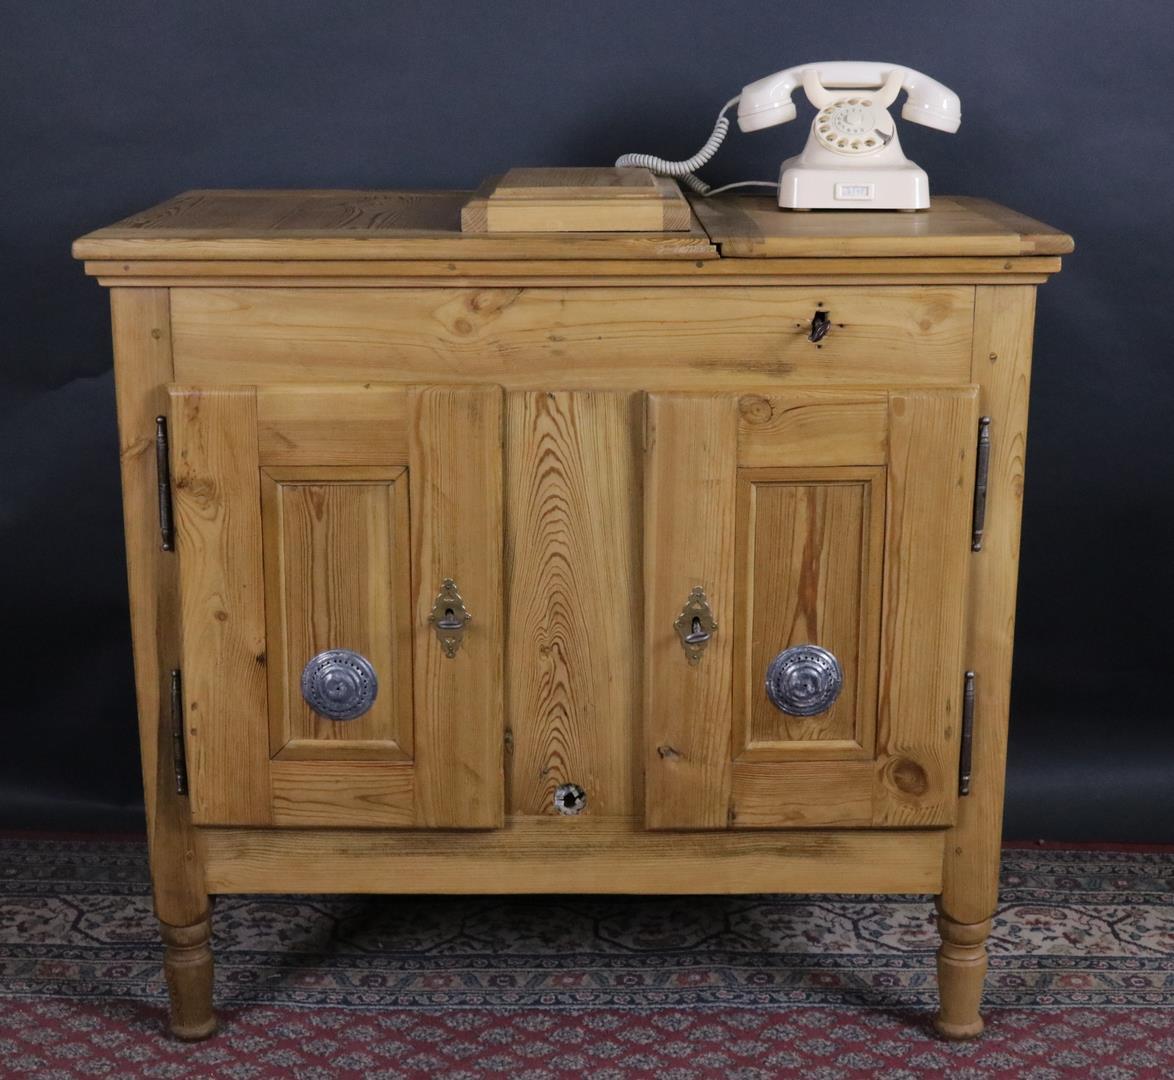 k hlschrank eisschrank antik biedermeier um 1870. Black Bedroom Furniture Sets. Home Design Ideas